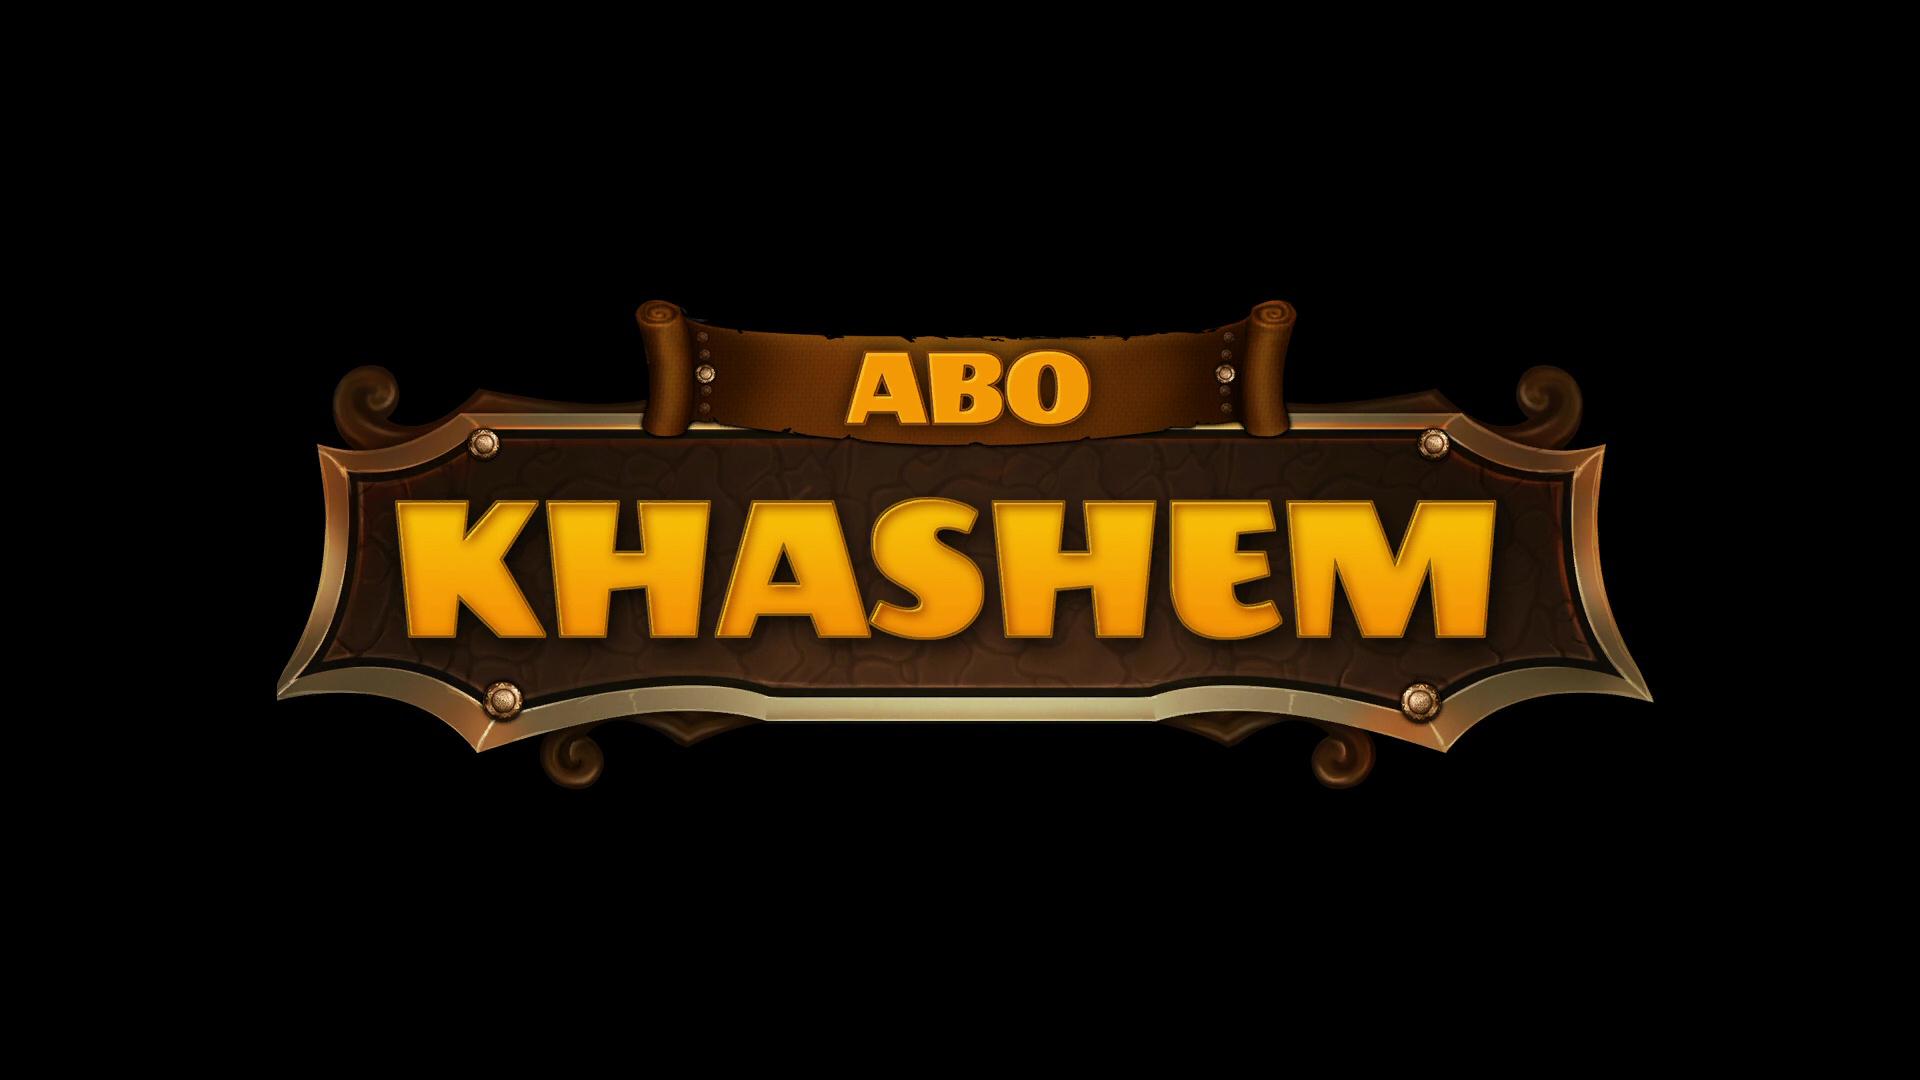 Abo Khashem – PS4 | Review